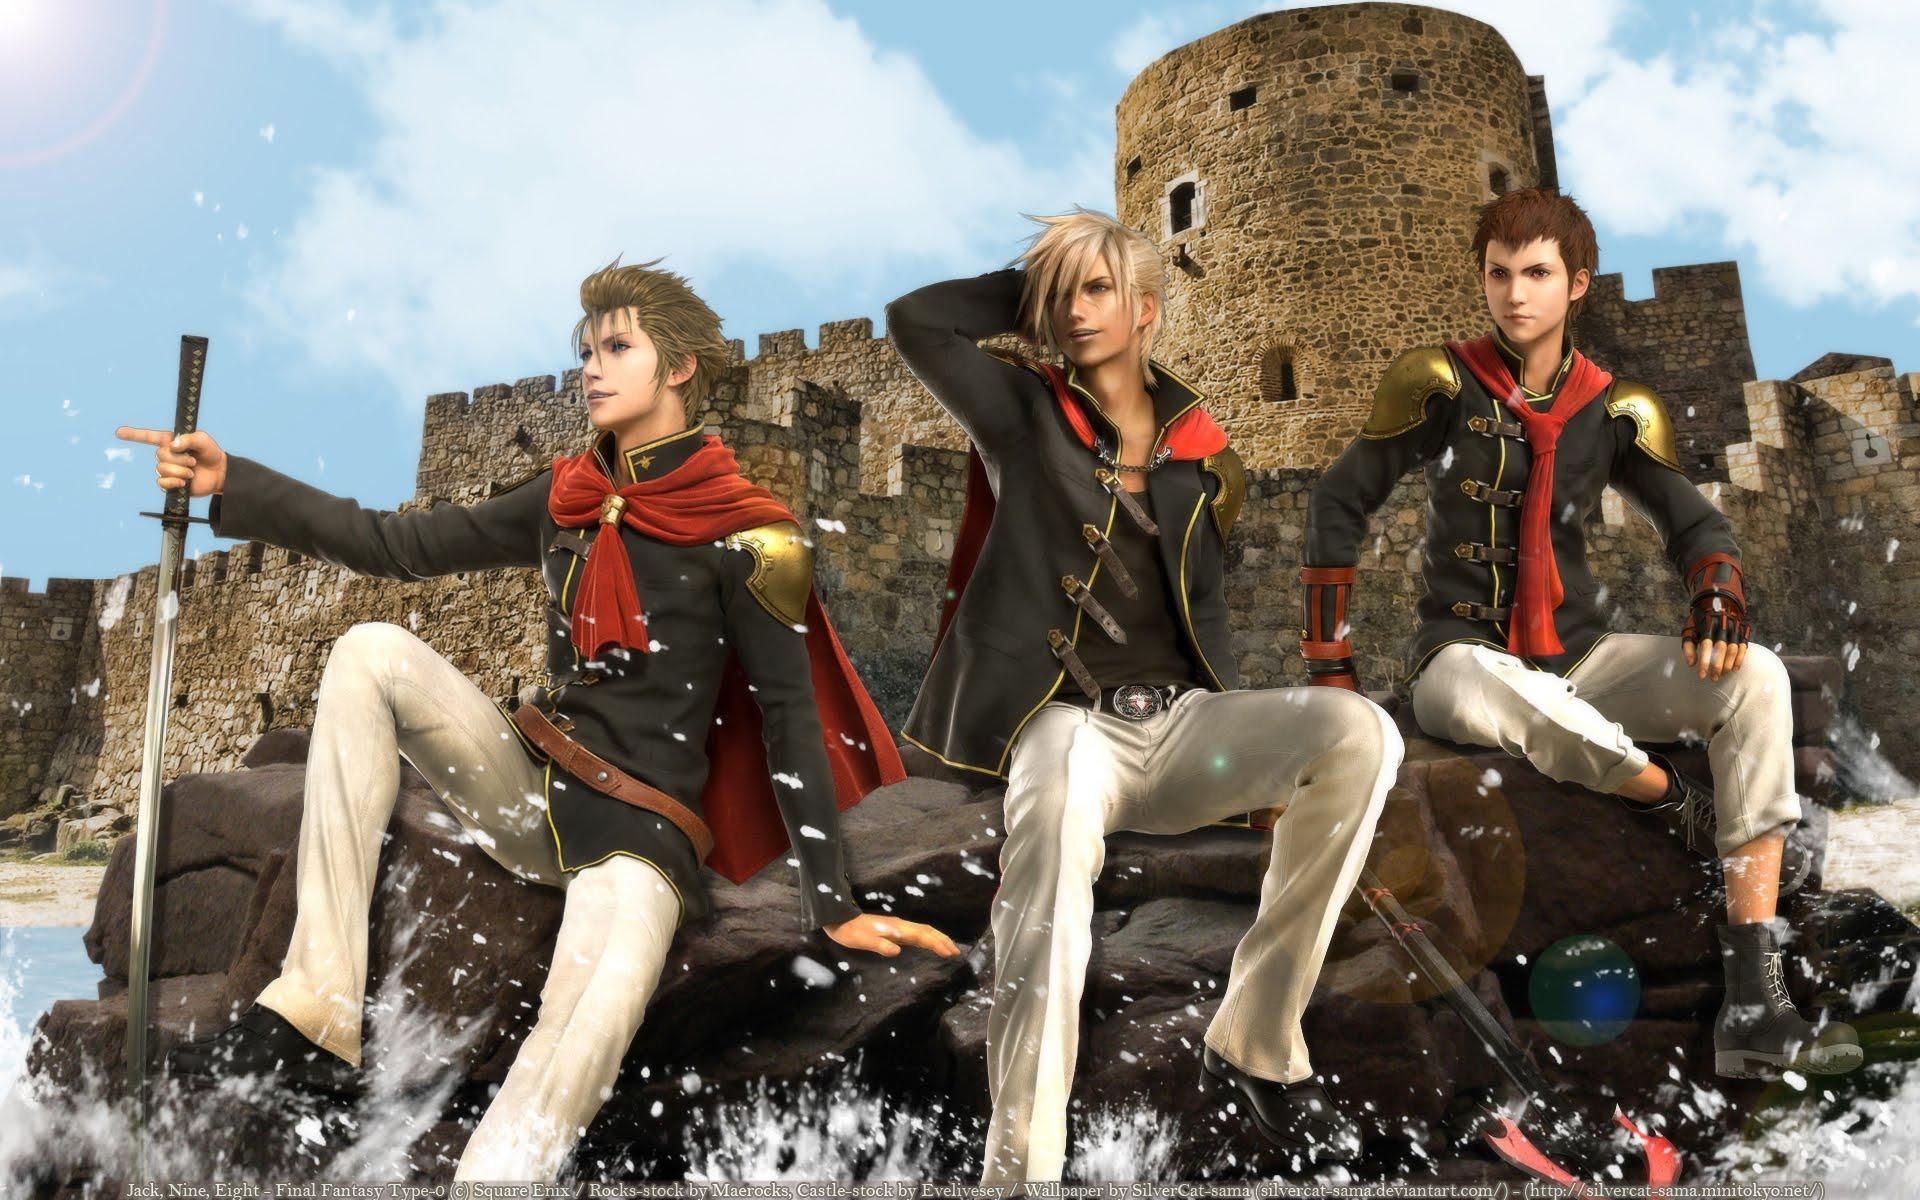 #TGS14: Final Fantasy Type-0